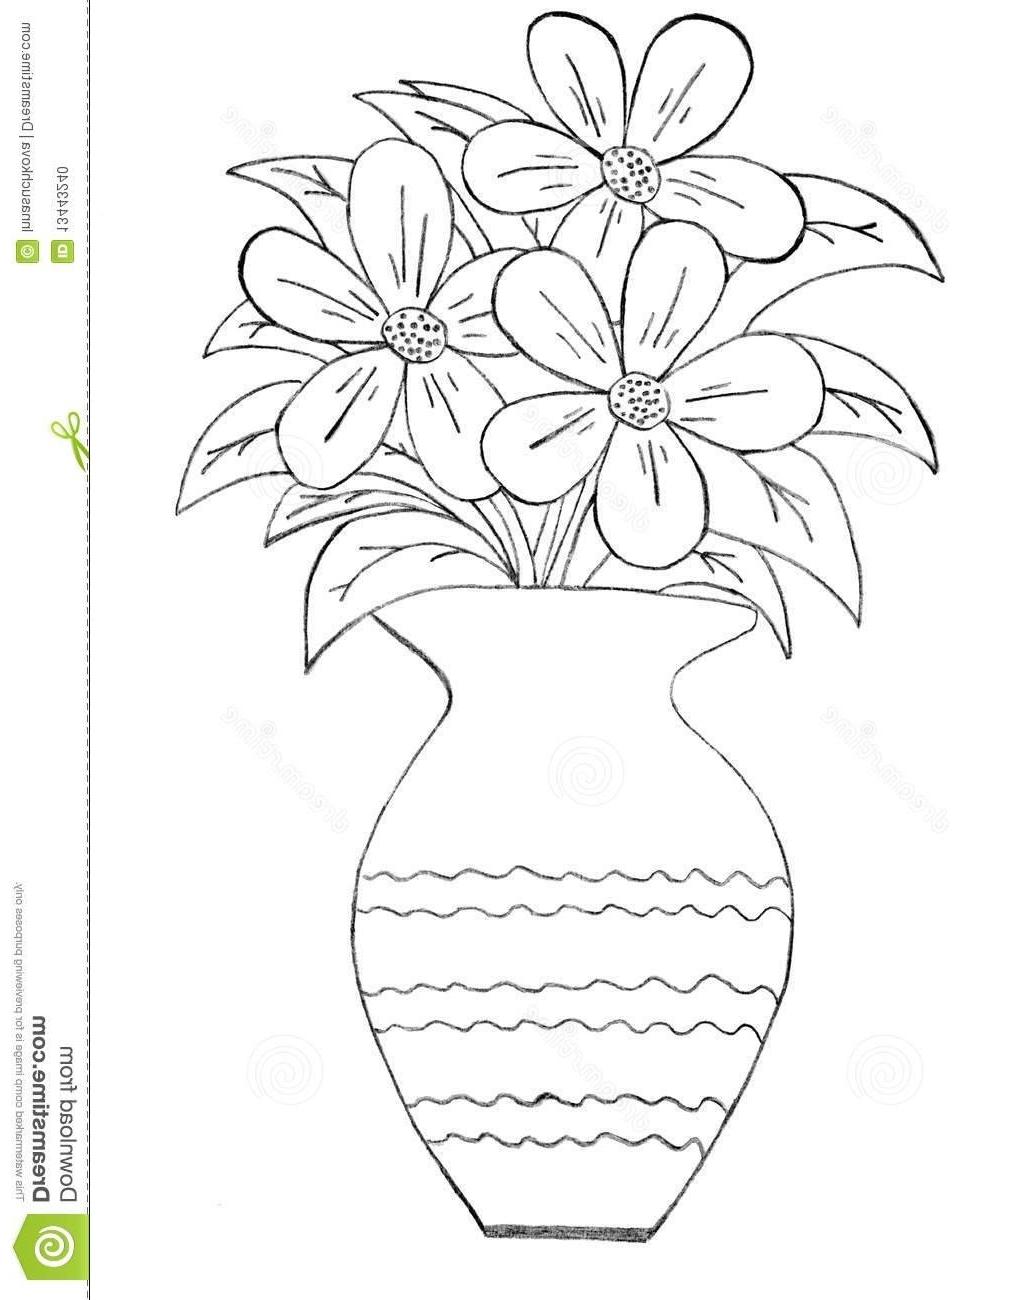 Drawn vase pencil drawing Flowers Of vase At Art